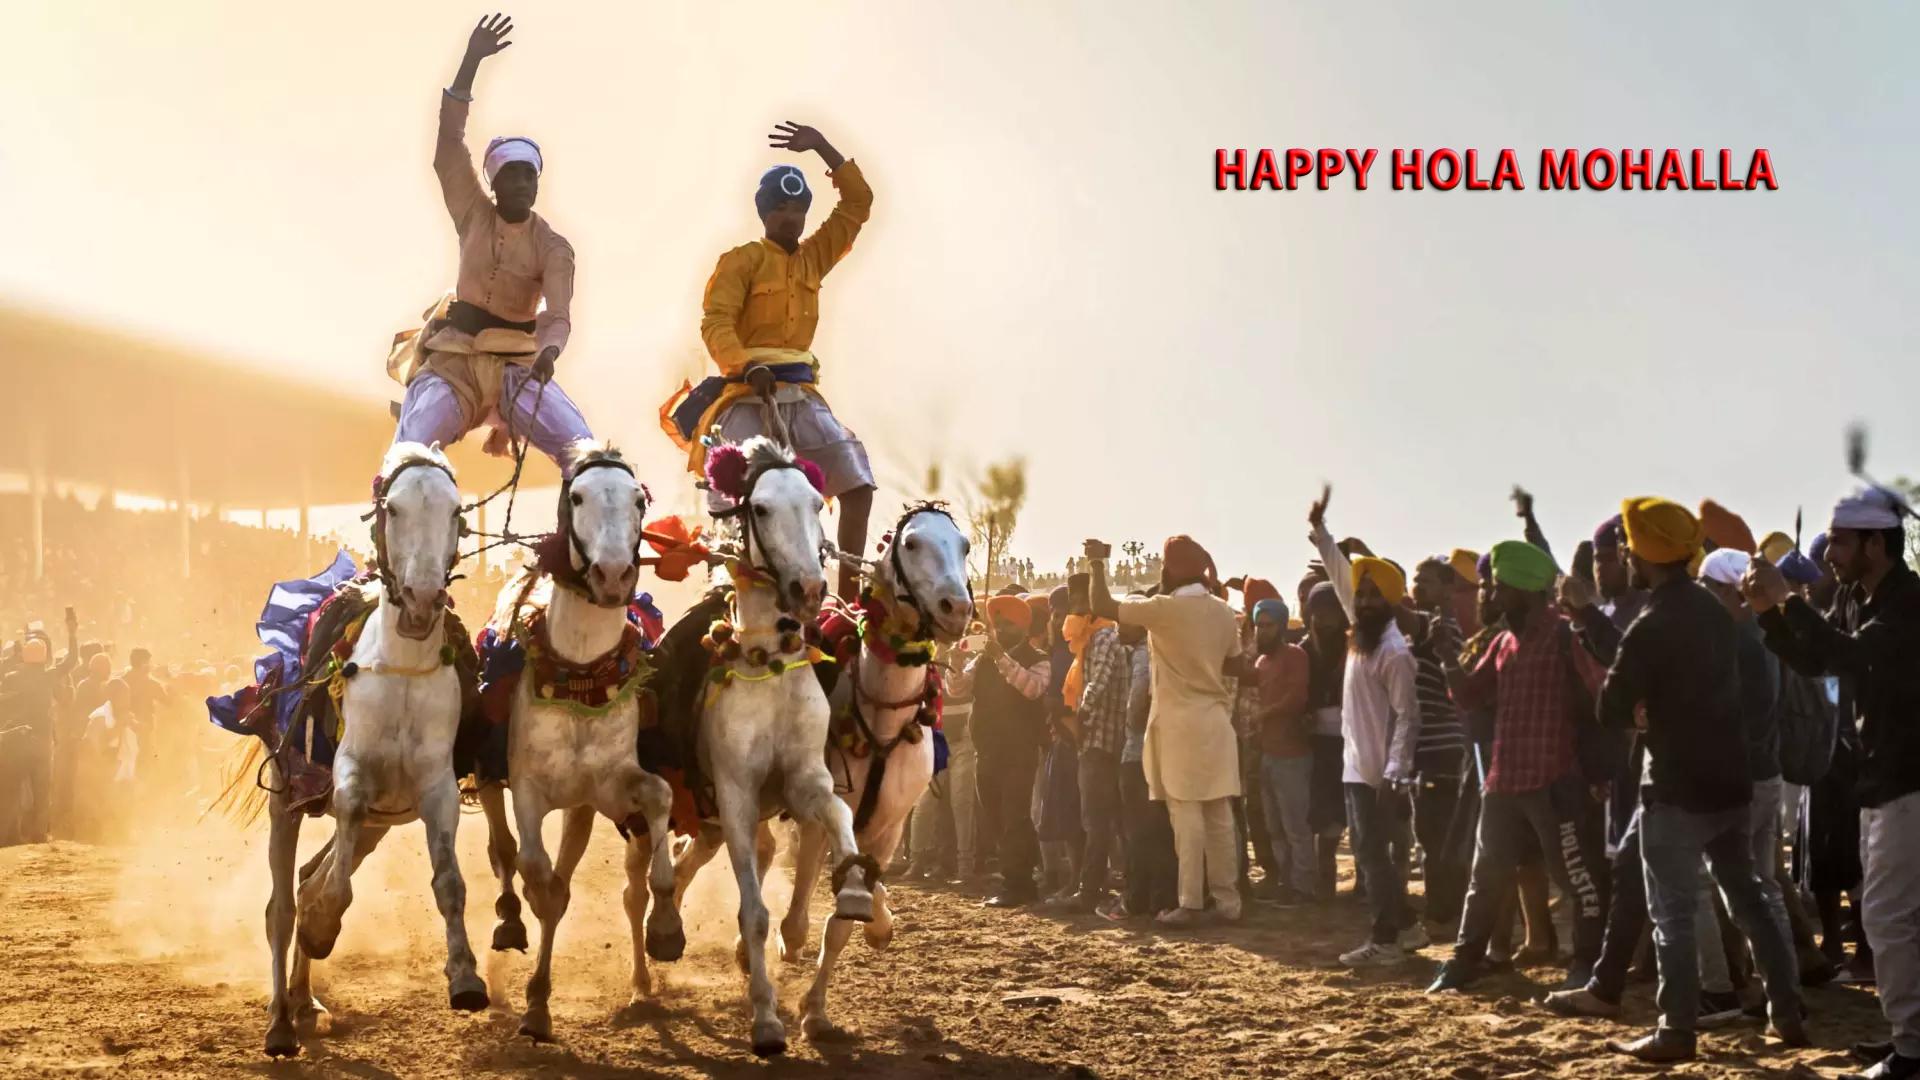 Hola Mohalla Festiva Photos Download